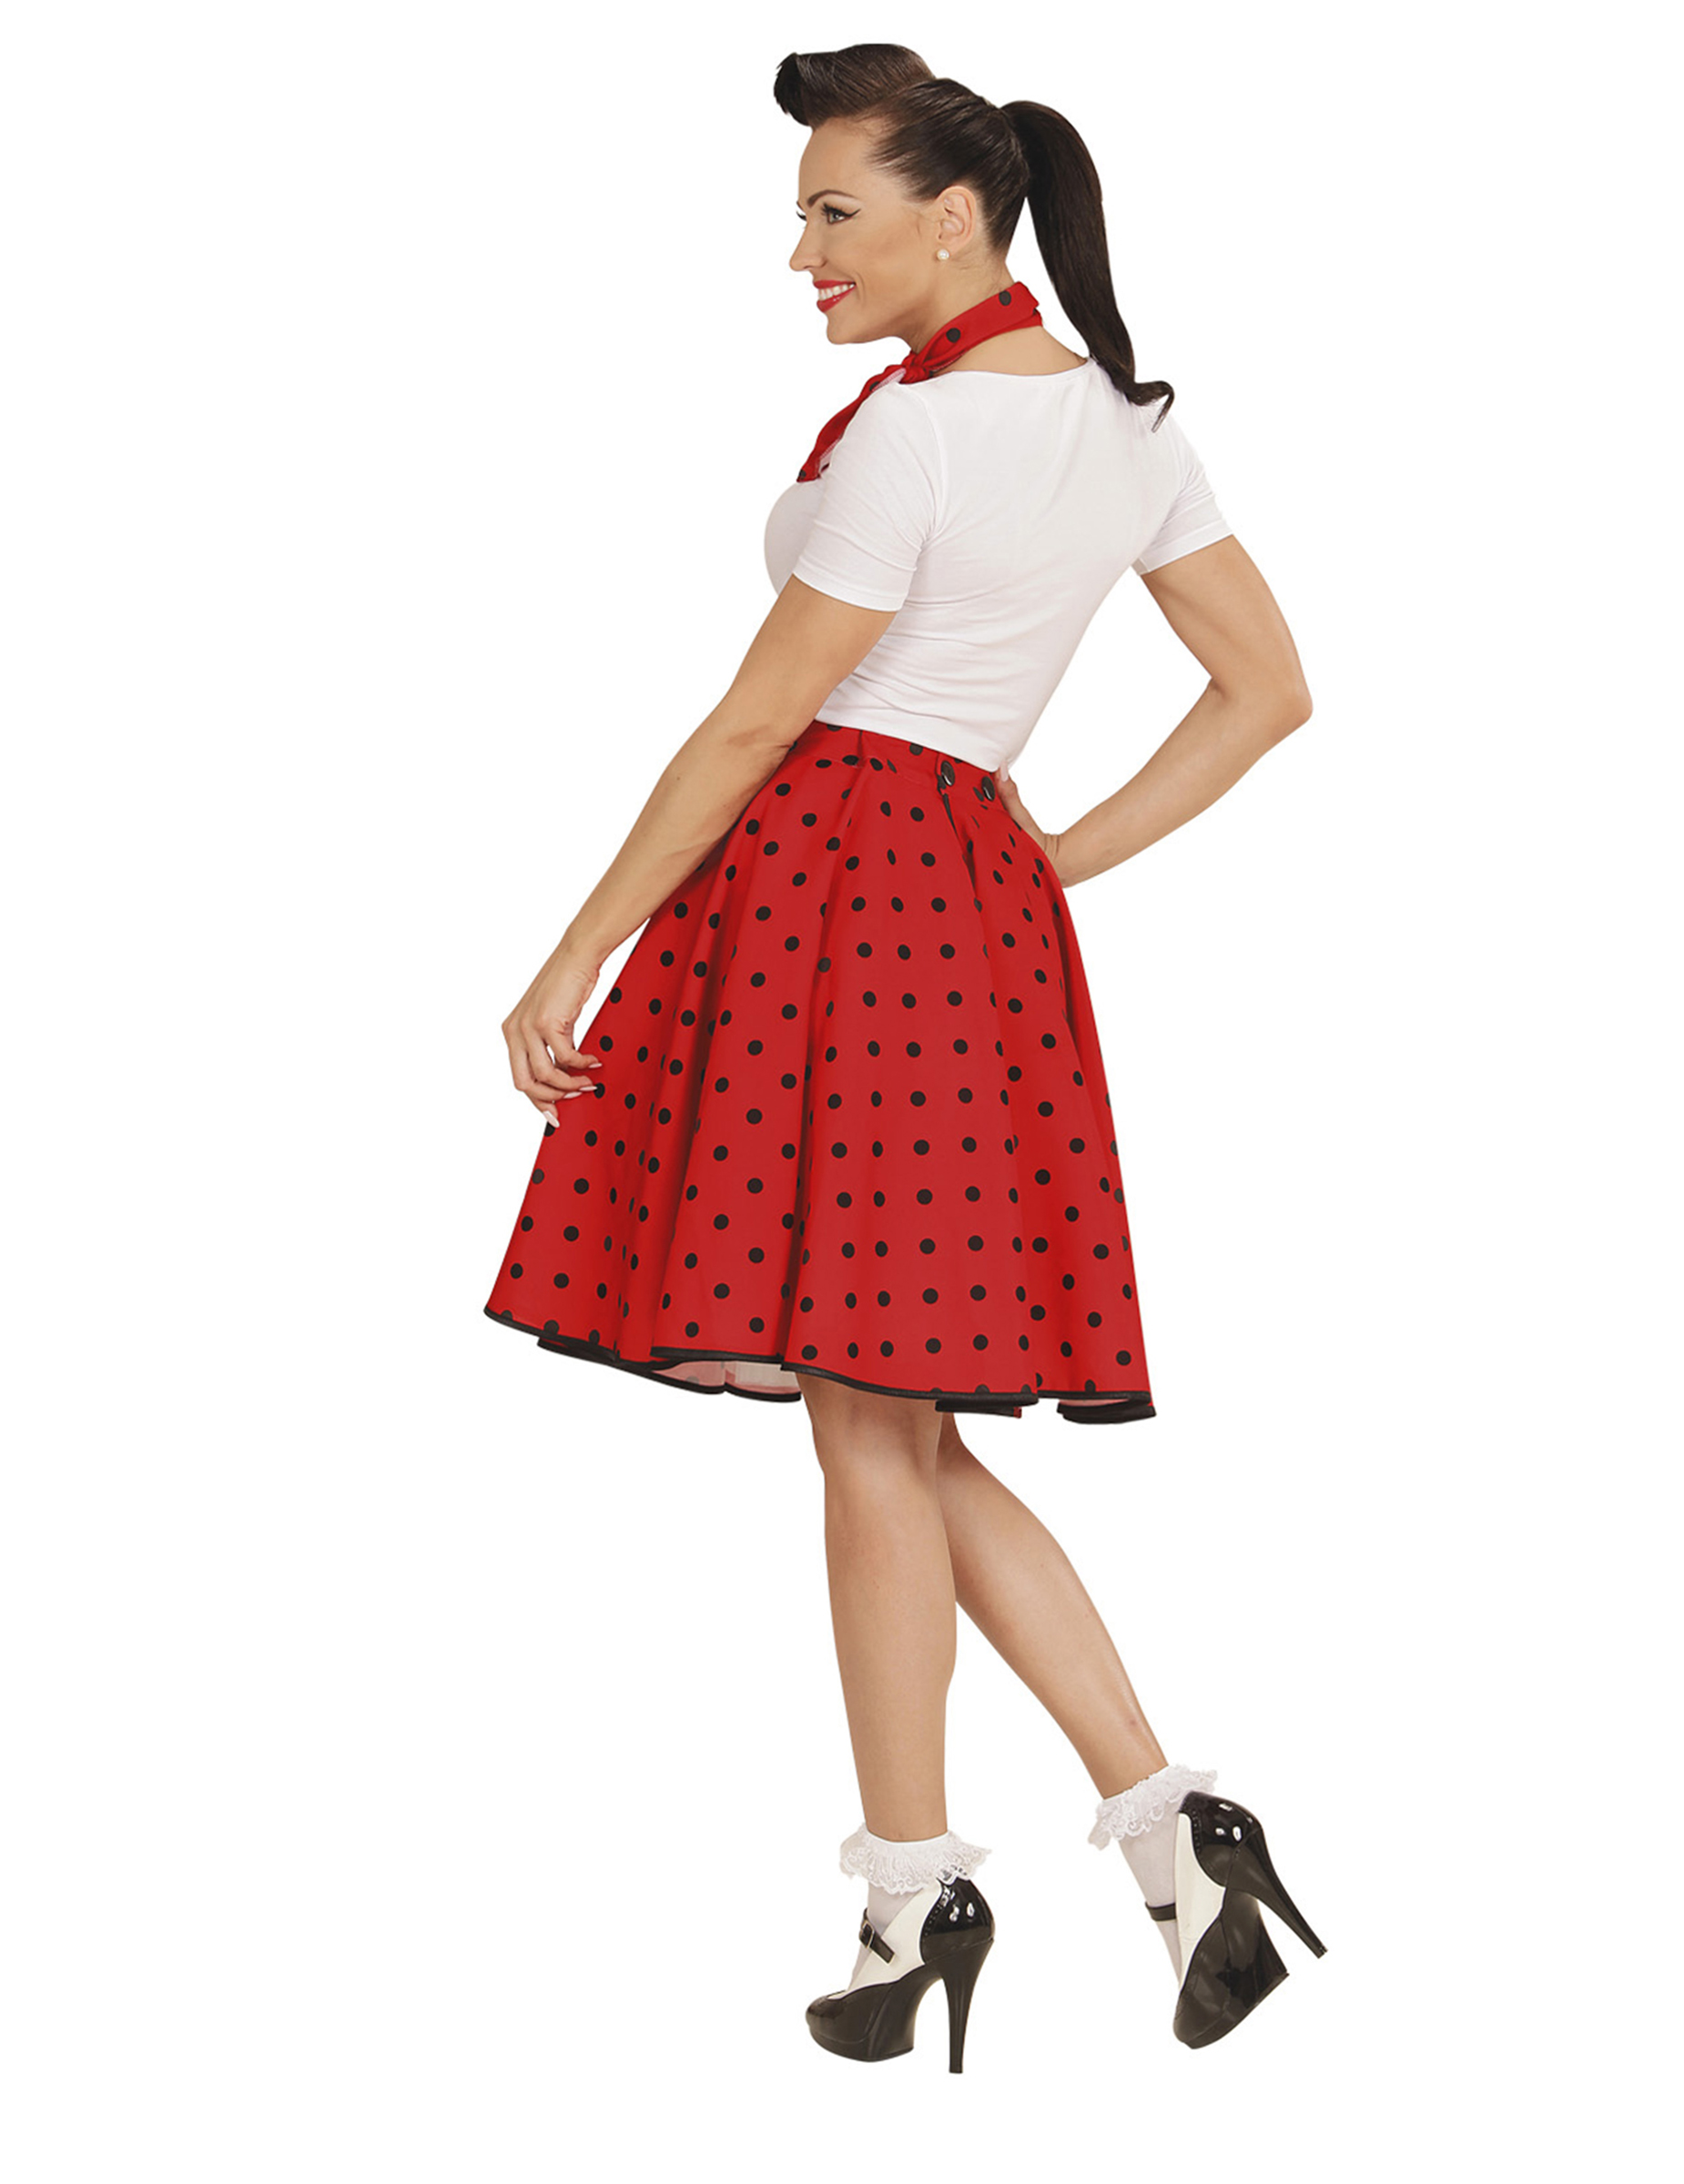 Costume gonna e foulard rosso a pois donna  Costumi adulti eee0680fbd1